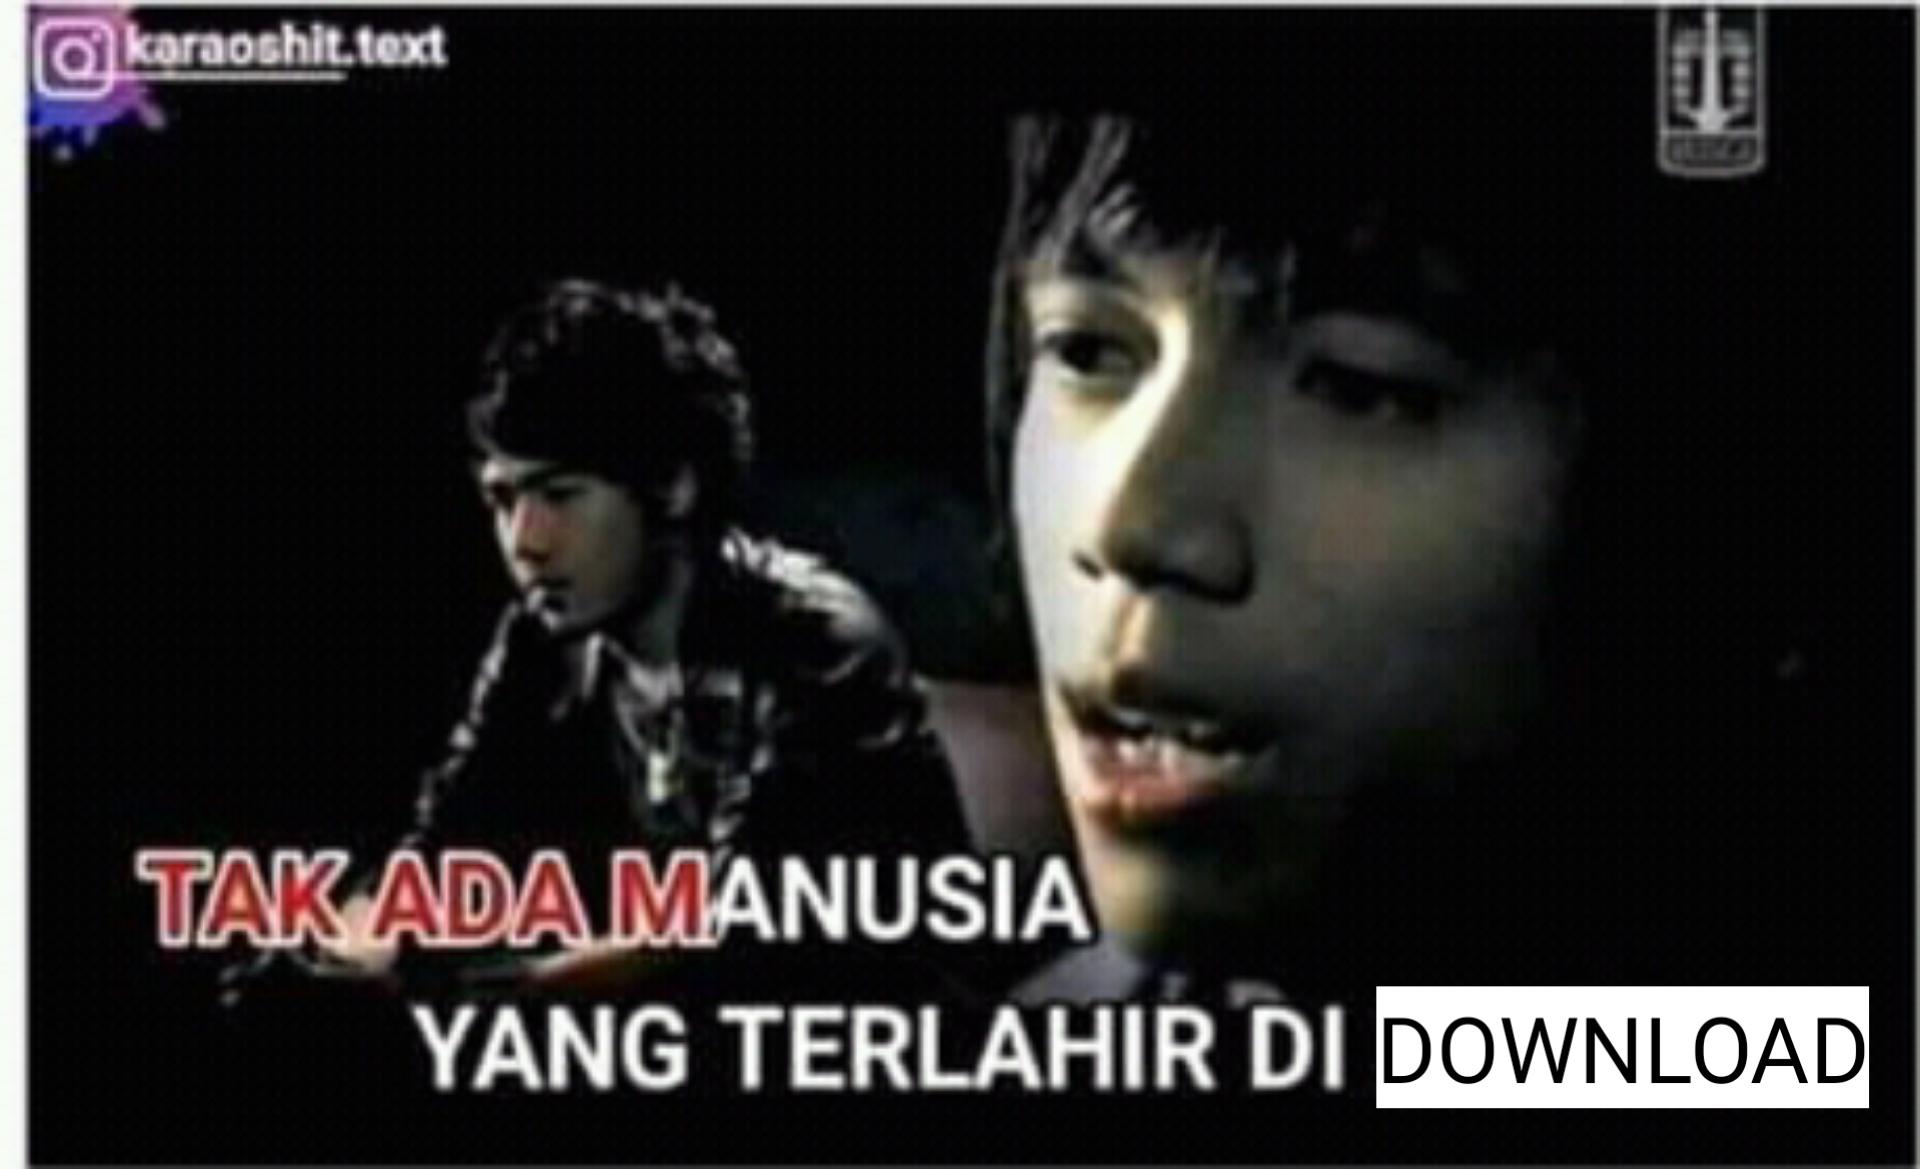 13 Meme Plesetan Lagu Ini Absurdnya Bikin Ngakak Indonesia